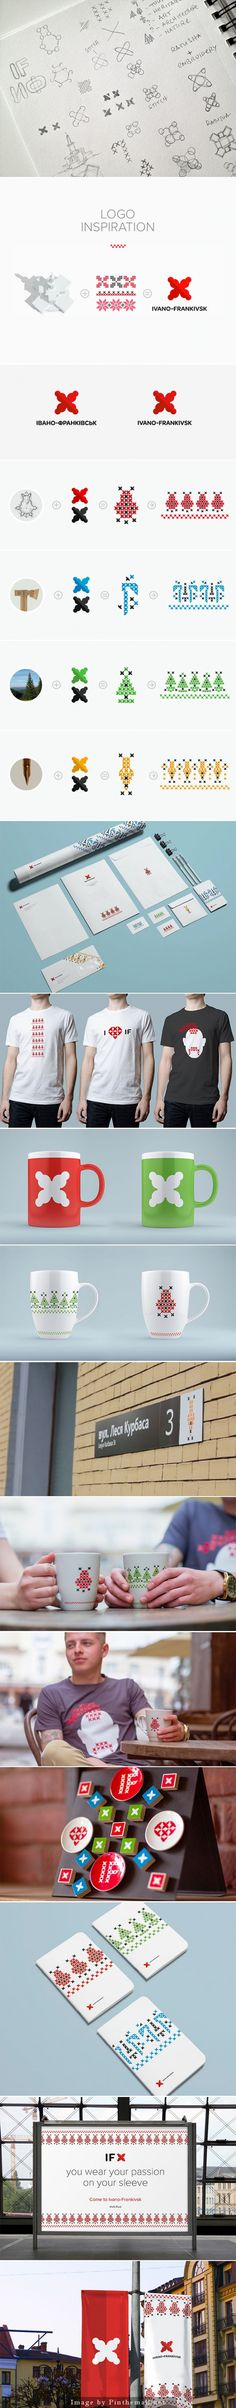 Ivano-Frankivsk (IF) 브랜드 로고를 이용해 제작한 티셔츠, 수첩, 머그잔 등등 너무 예쁨